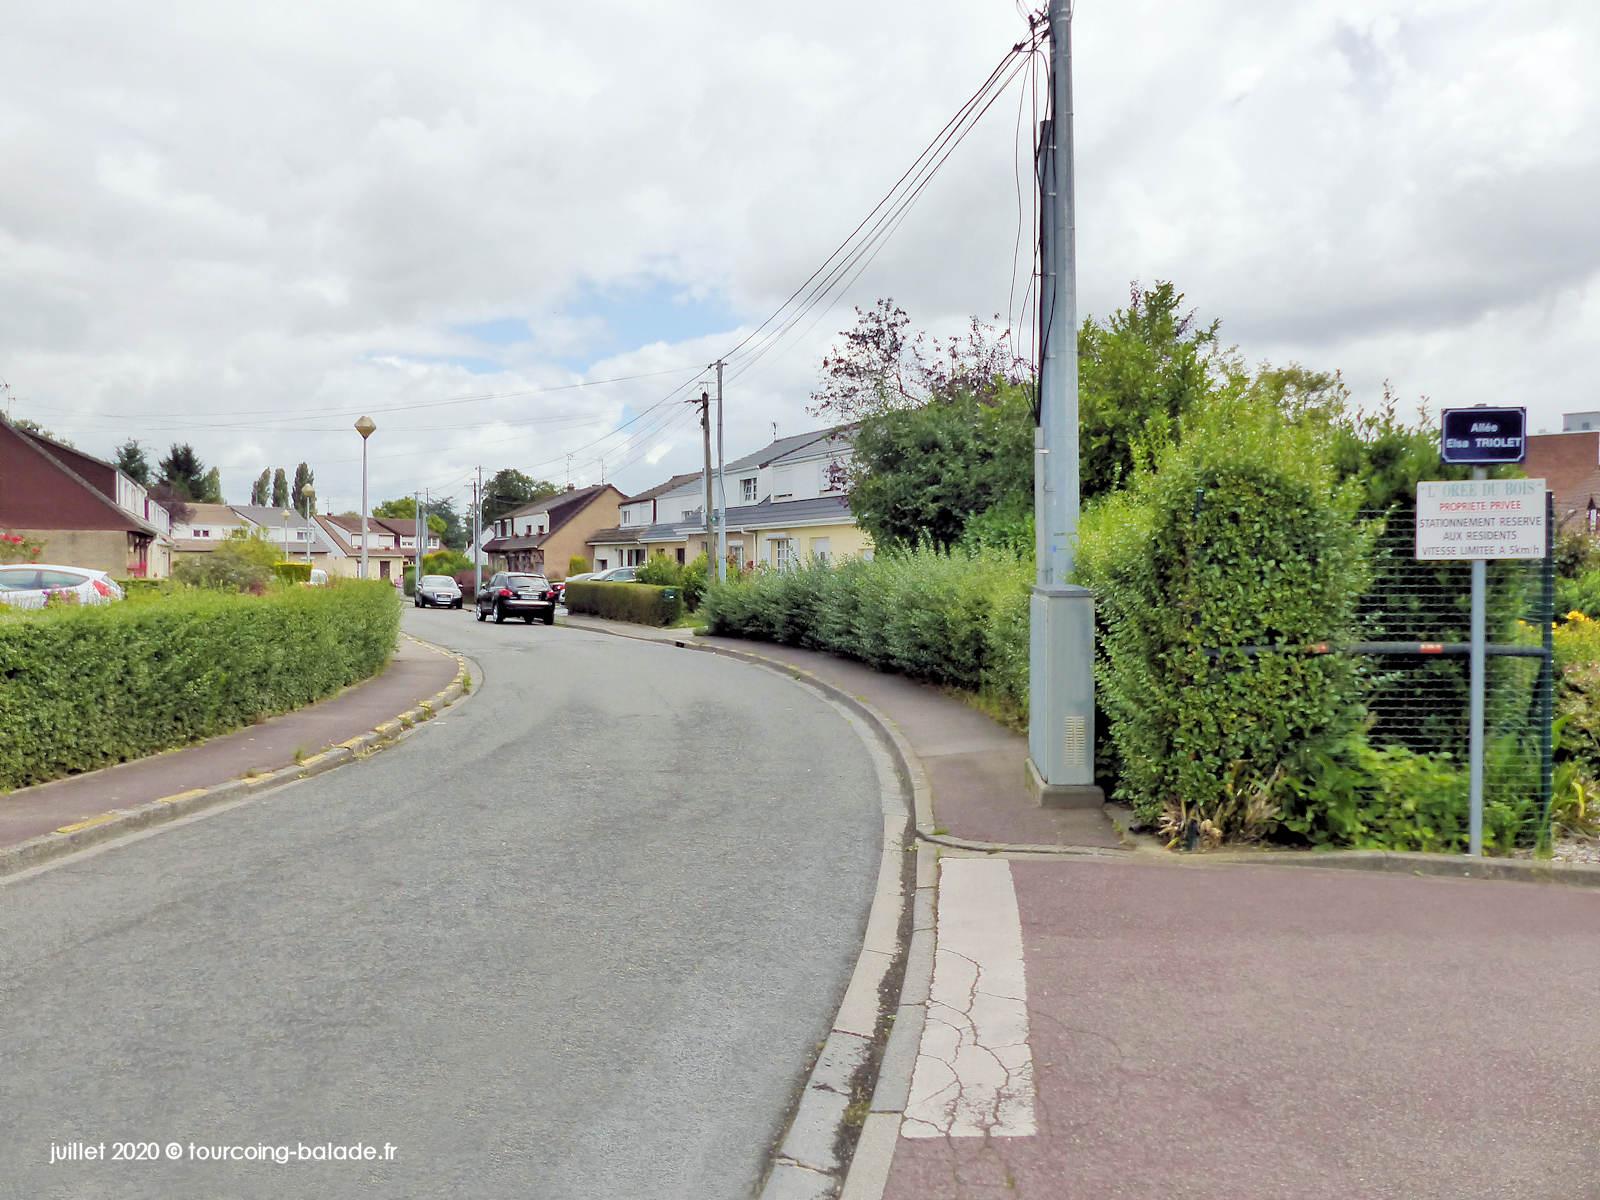 Rue de l'Adjudant Chef Leroy, Tourcoing 2020